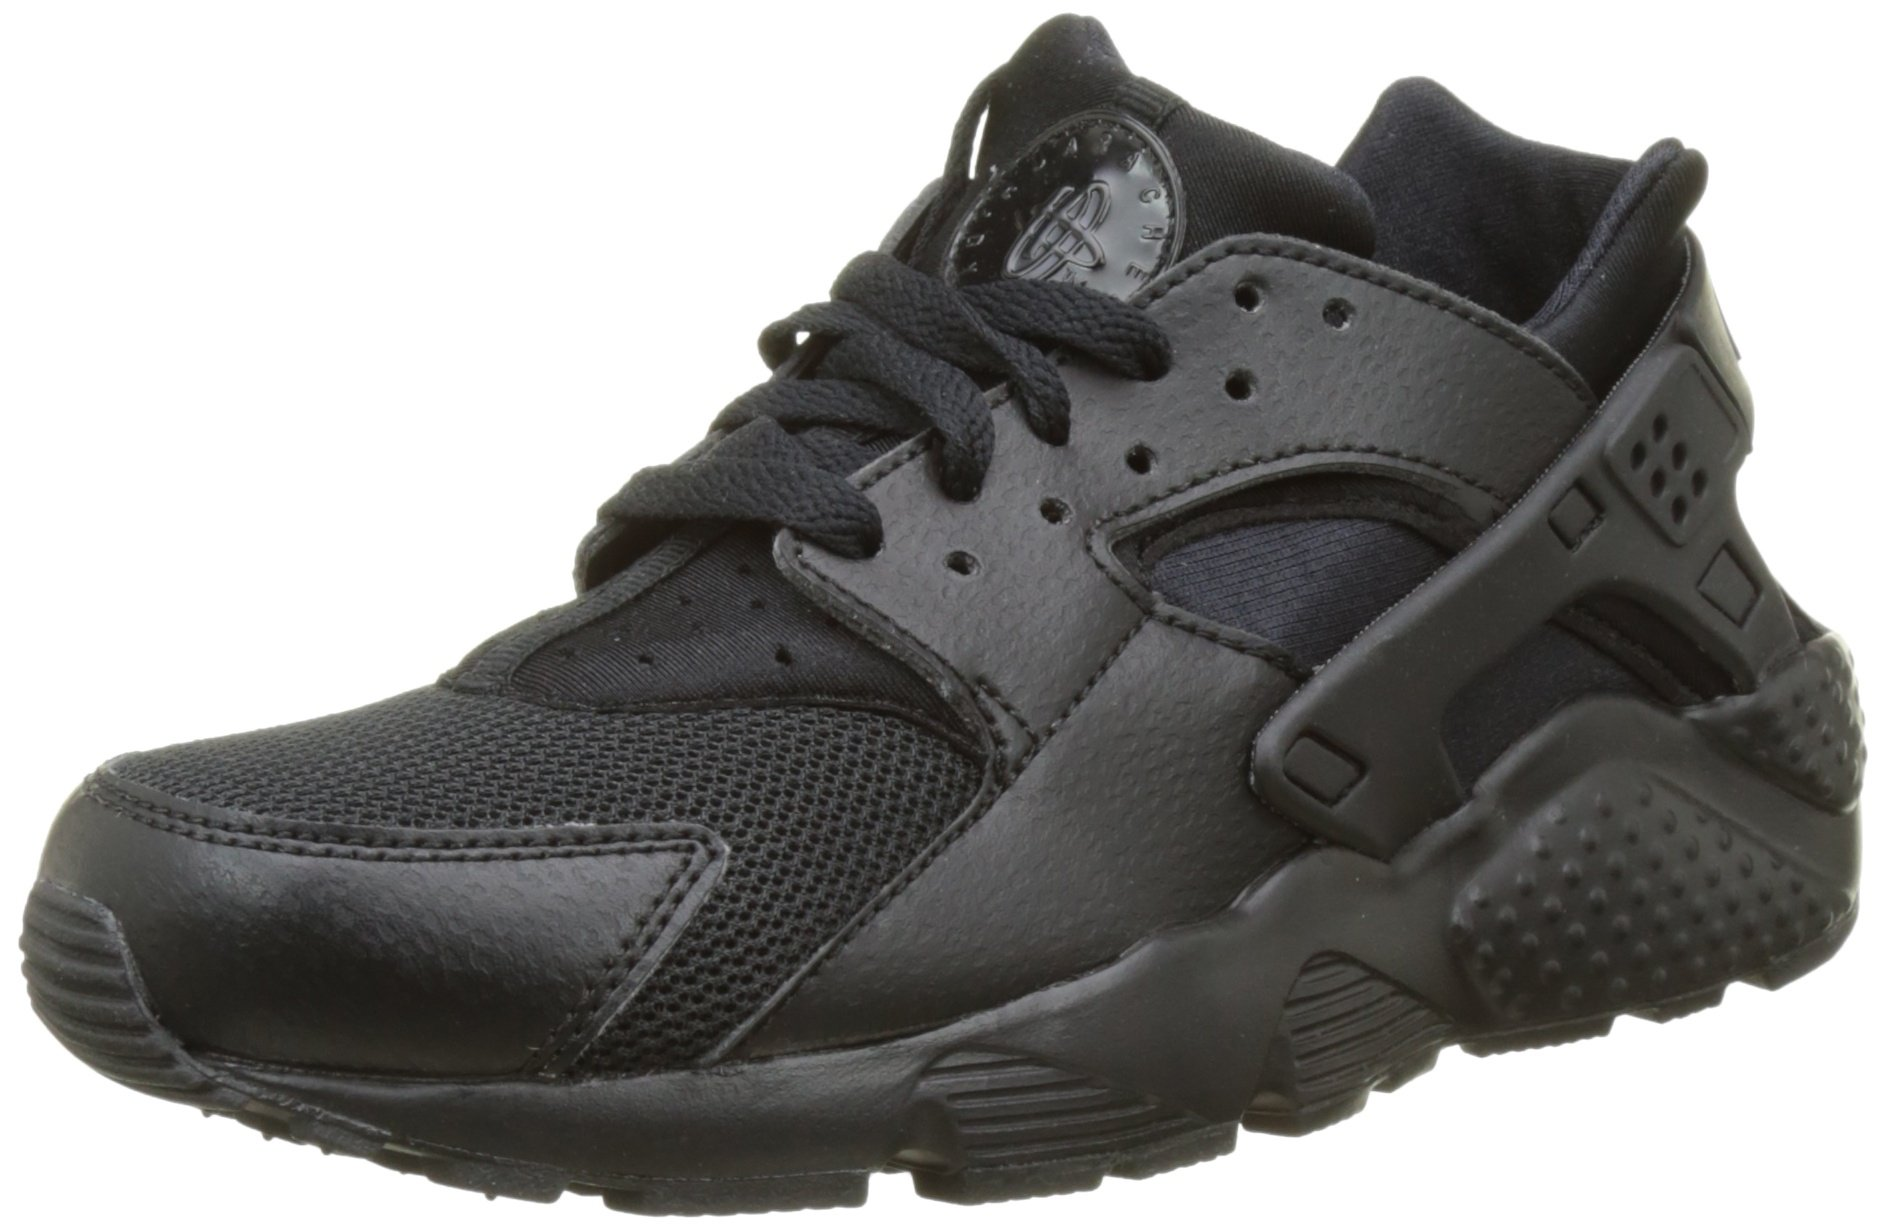 Nike Youths Huarache Run Black Synthetic Trainers 38 EU by NIKE